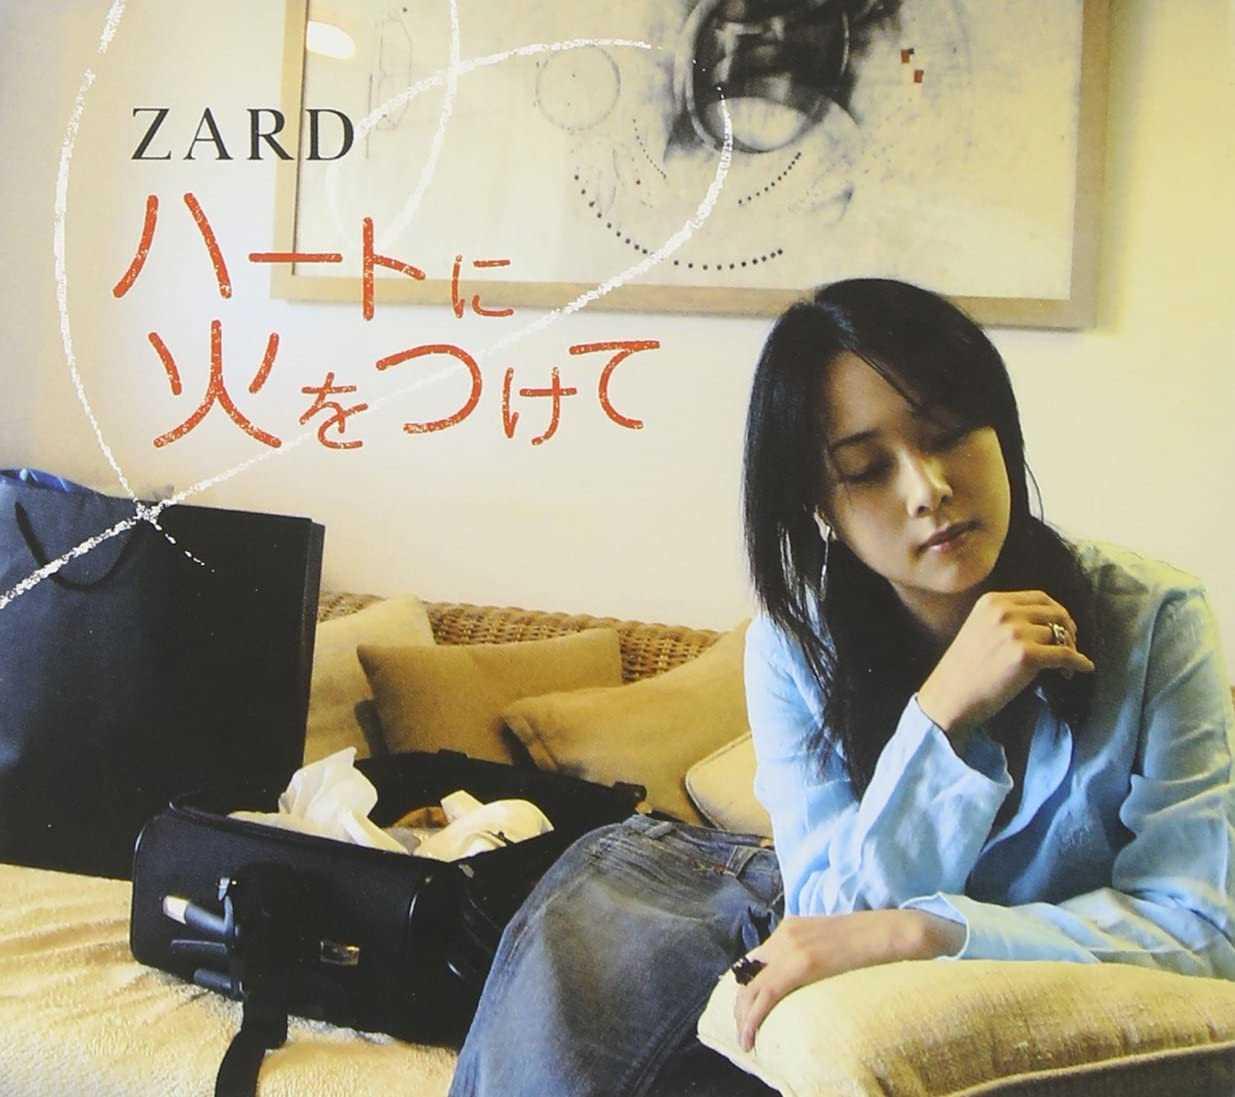 ZARDの「ハートに火をつけて」は未来への扉を開くウェディングソング